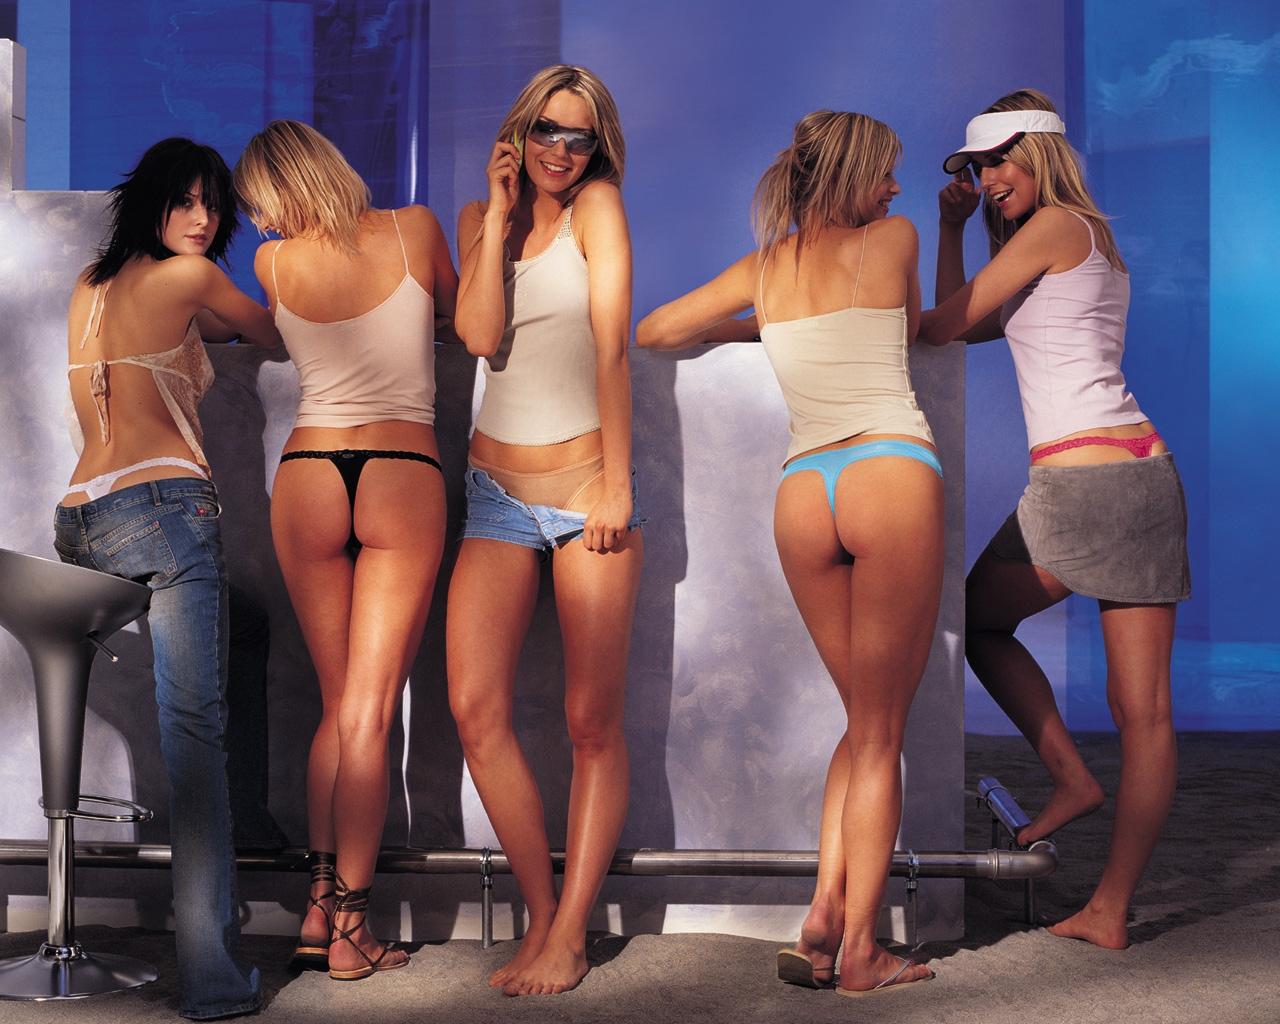 24p=10.7MB高清Sloggi内衣品牌鲜活色彩平面海报广告设计欣赏1280